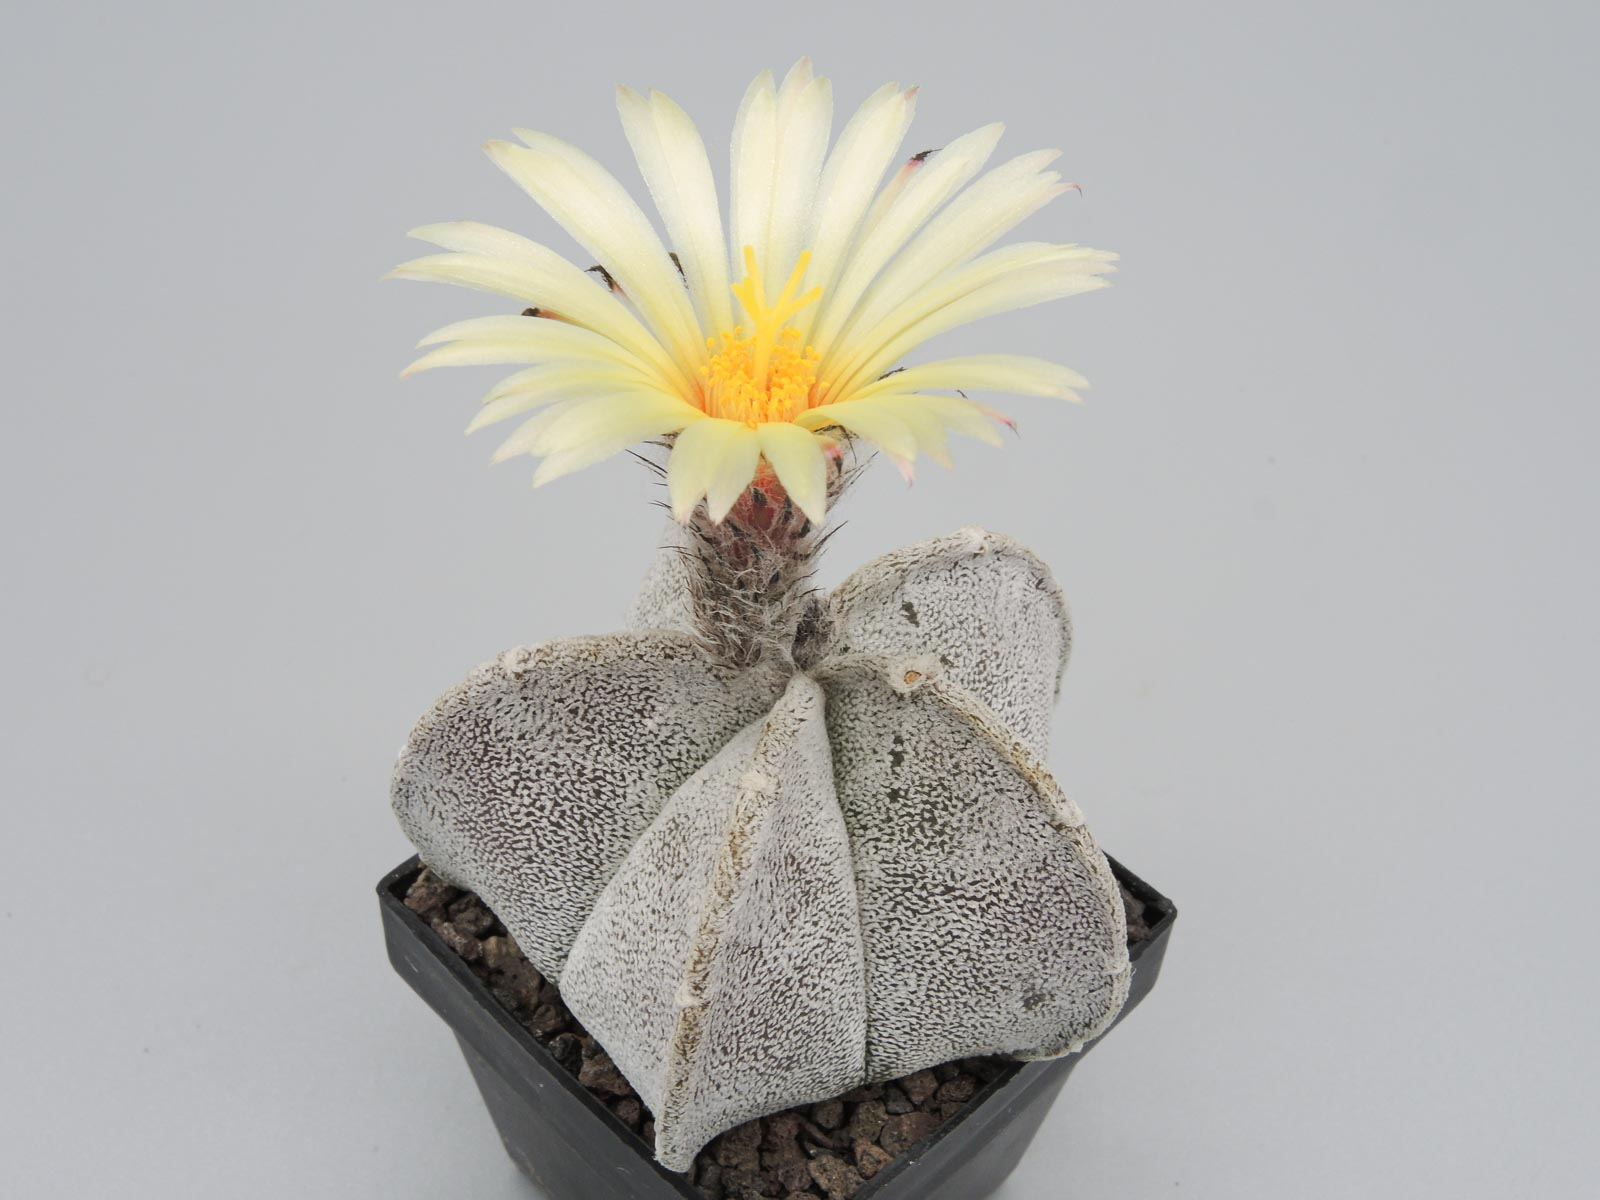 Astrophytum coahuilense Viesca